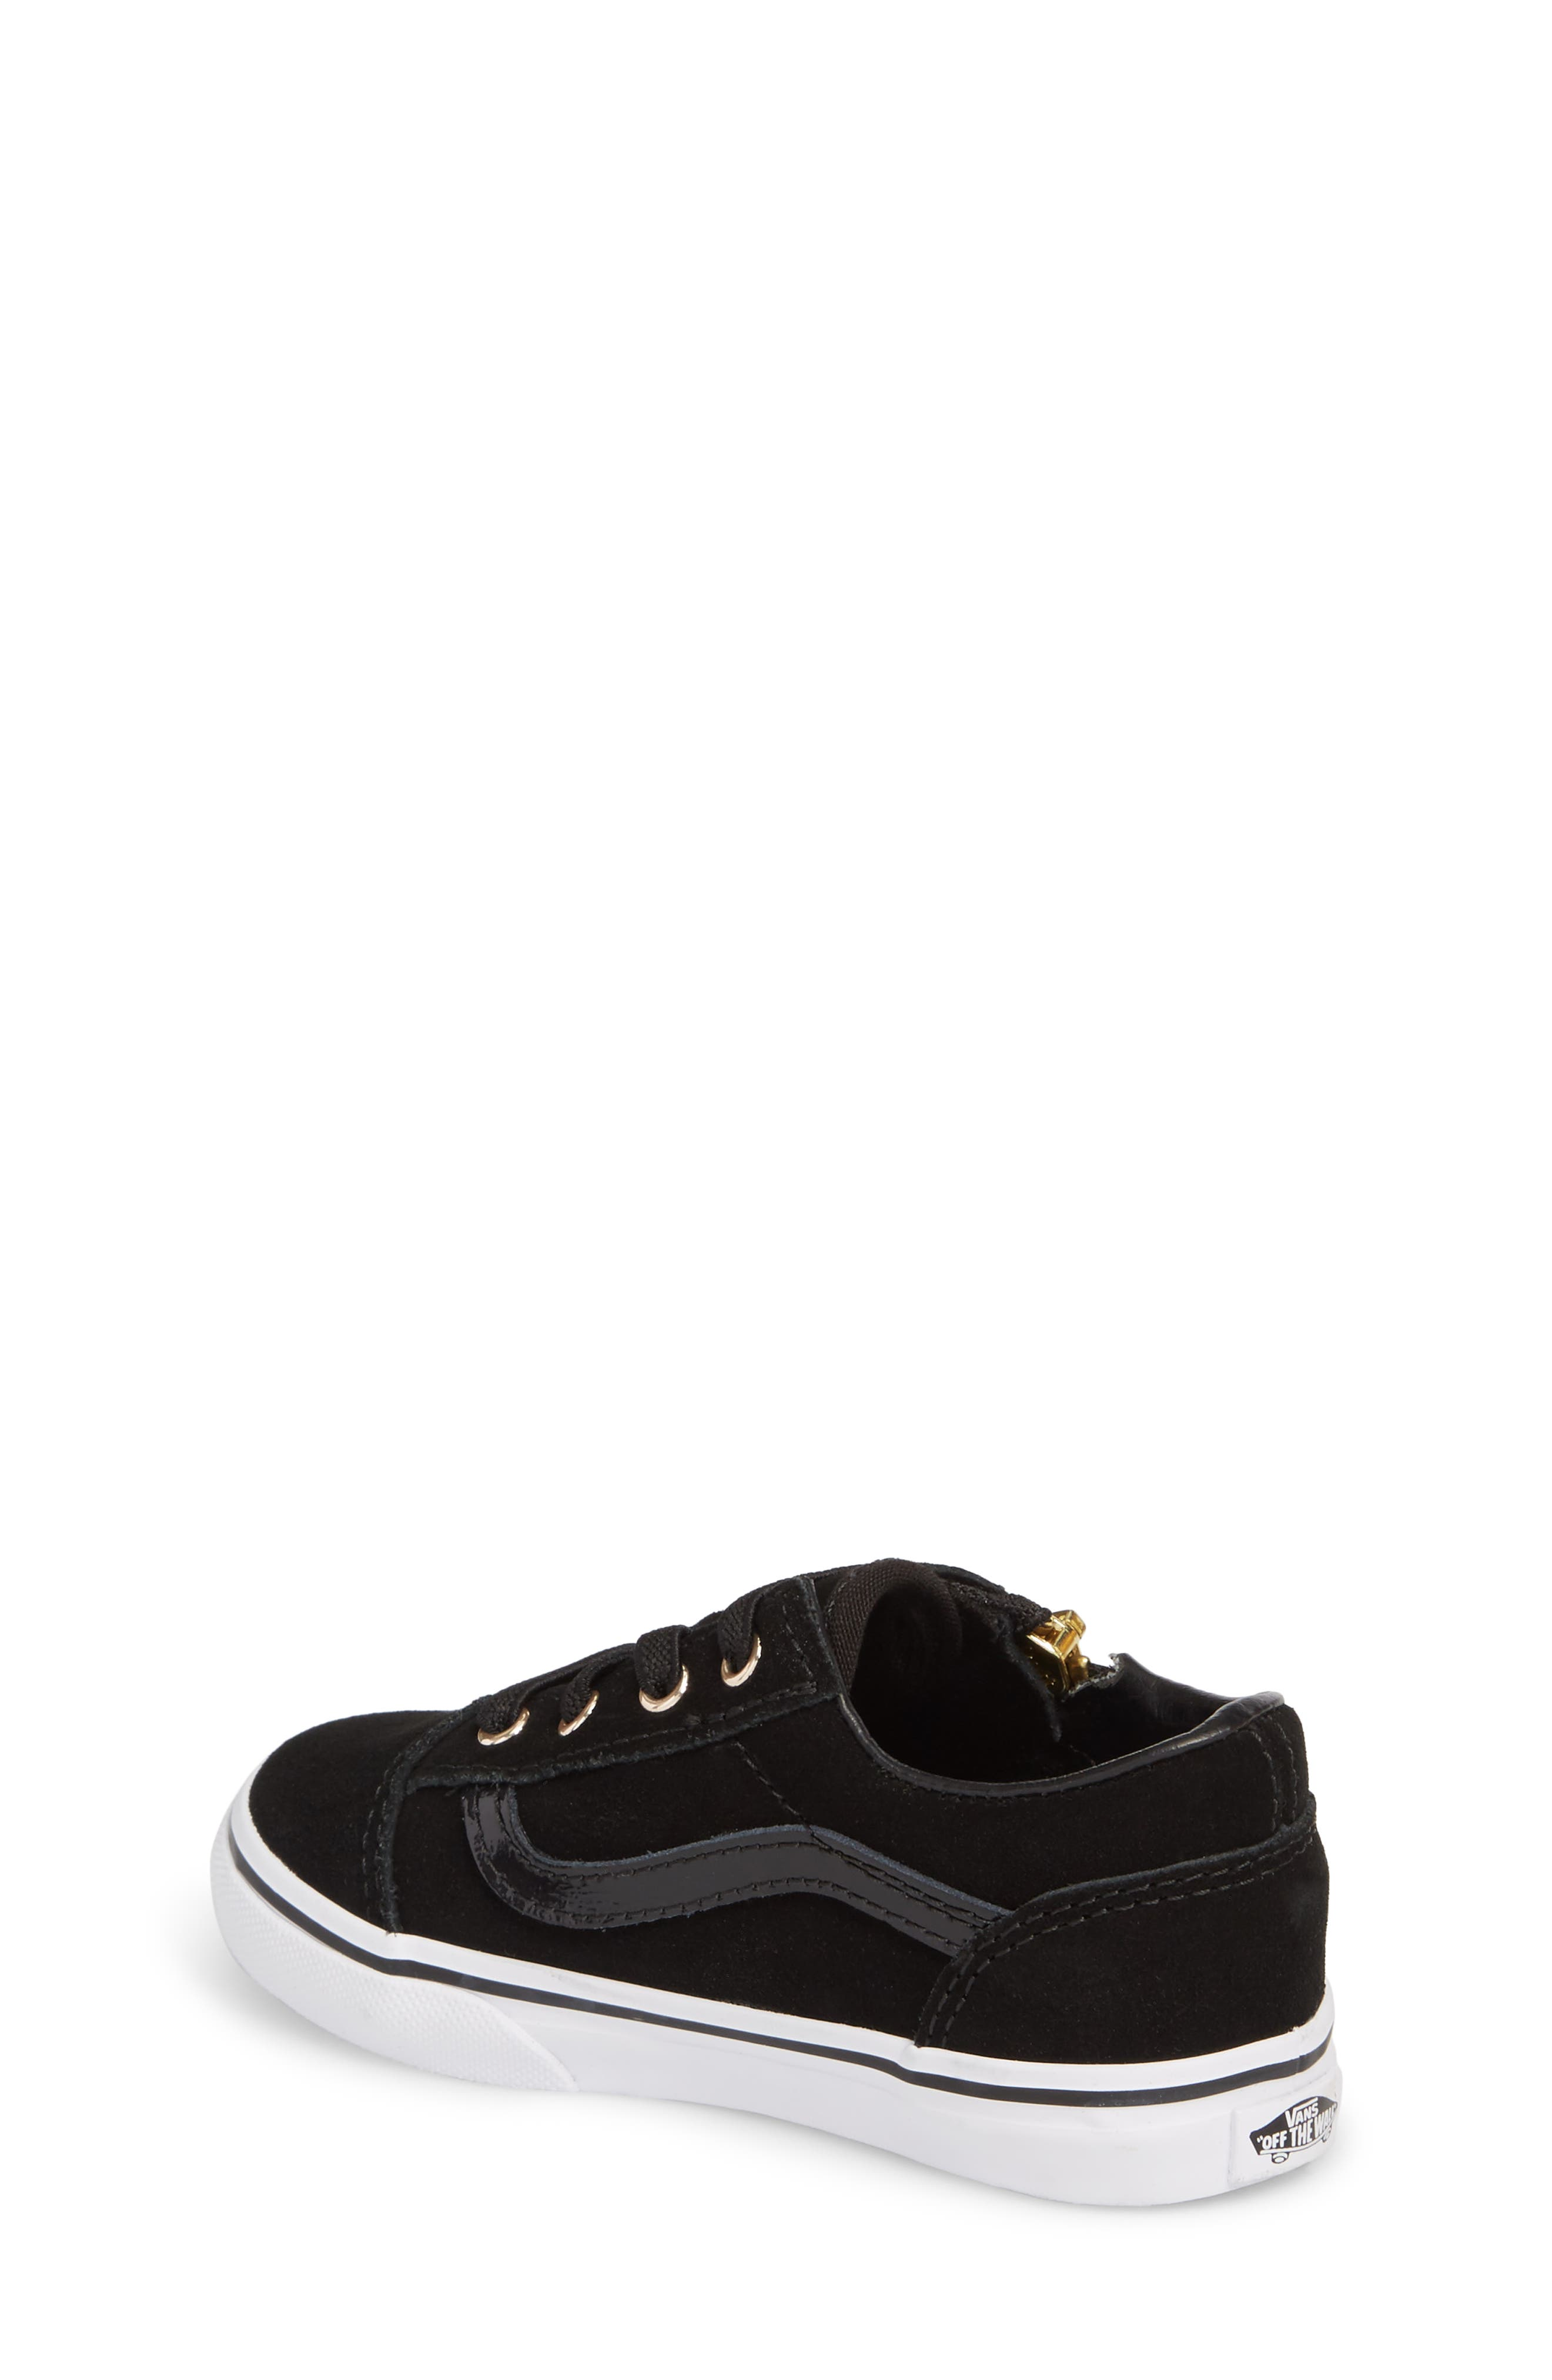 Old Skool Zip Sneaker,                             Alternate thumbnail 2, color,                             Black/ Gold